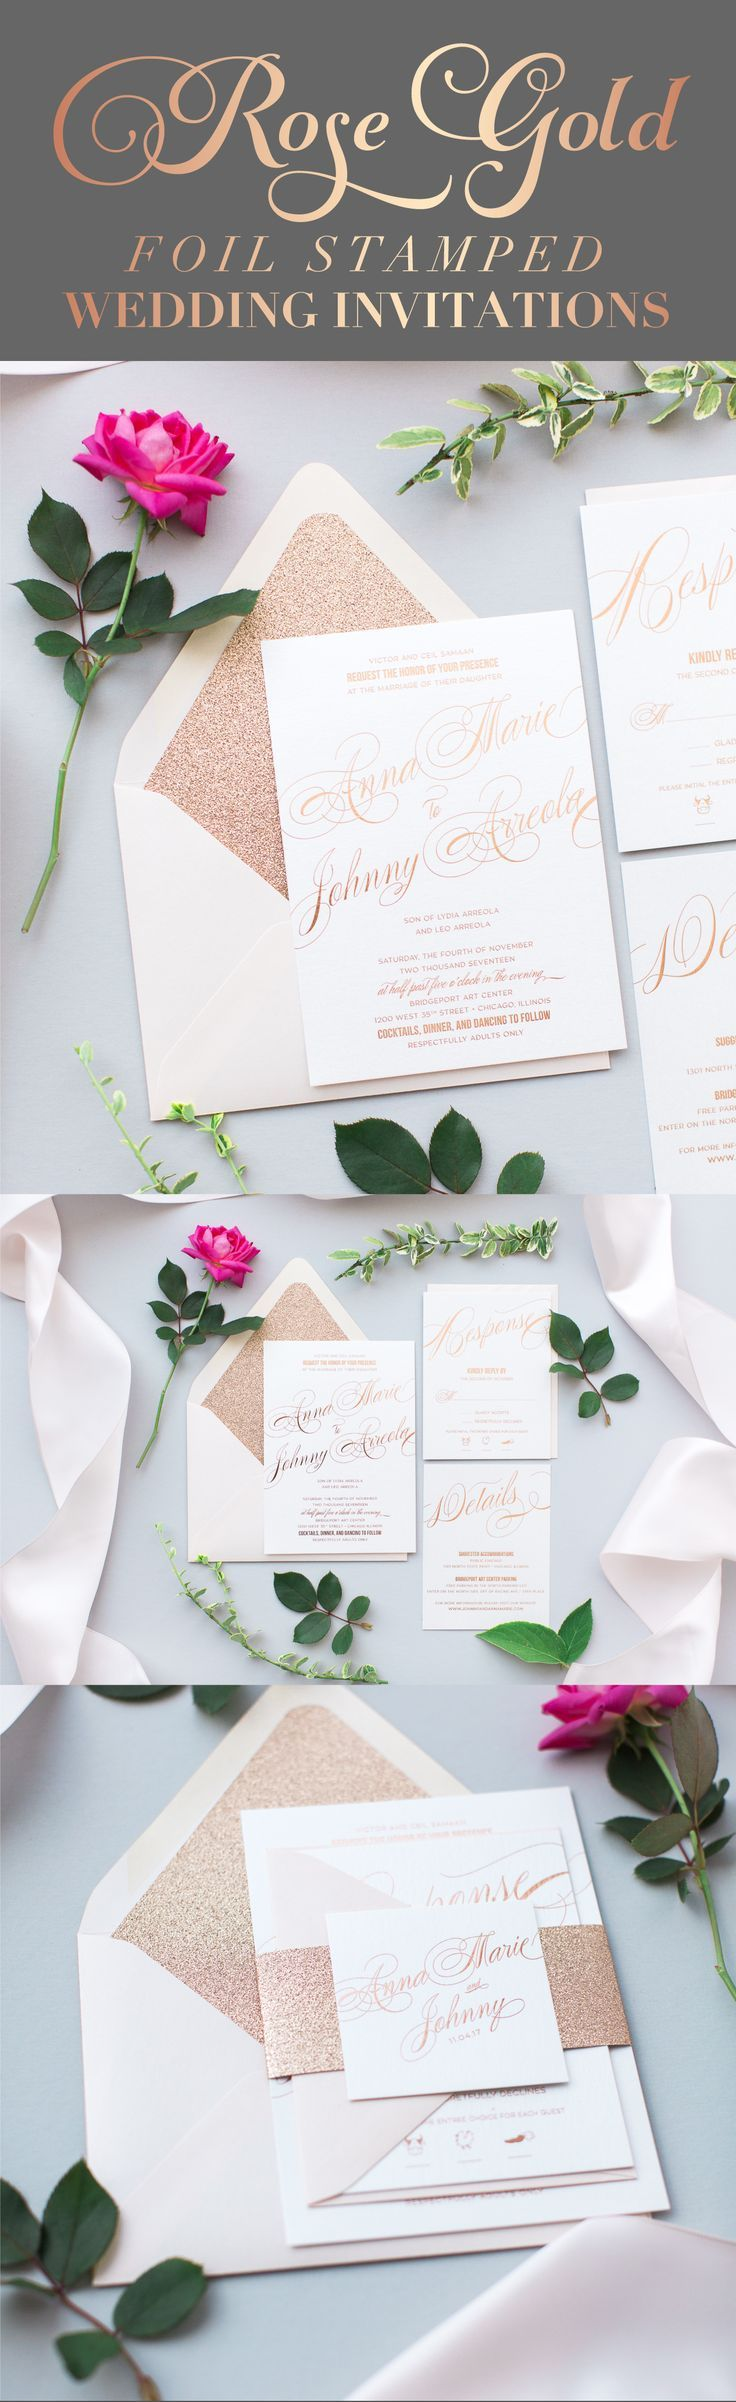 660 Best Rose Gold Wedding Love Images On Pinterest